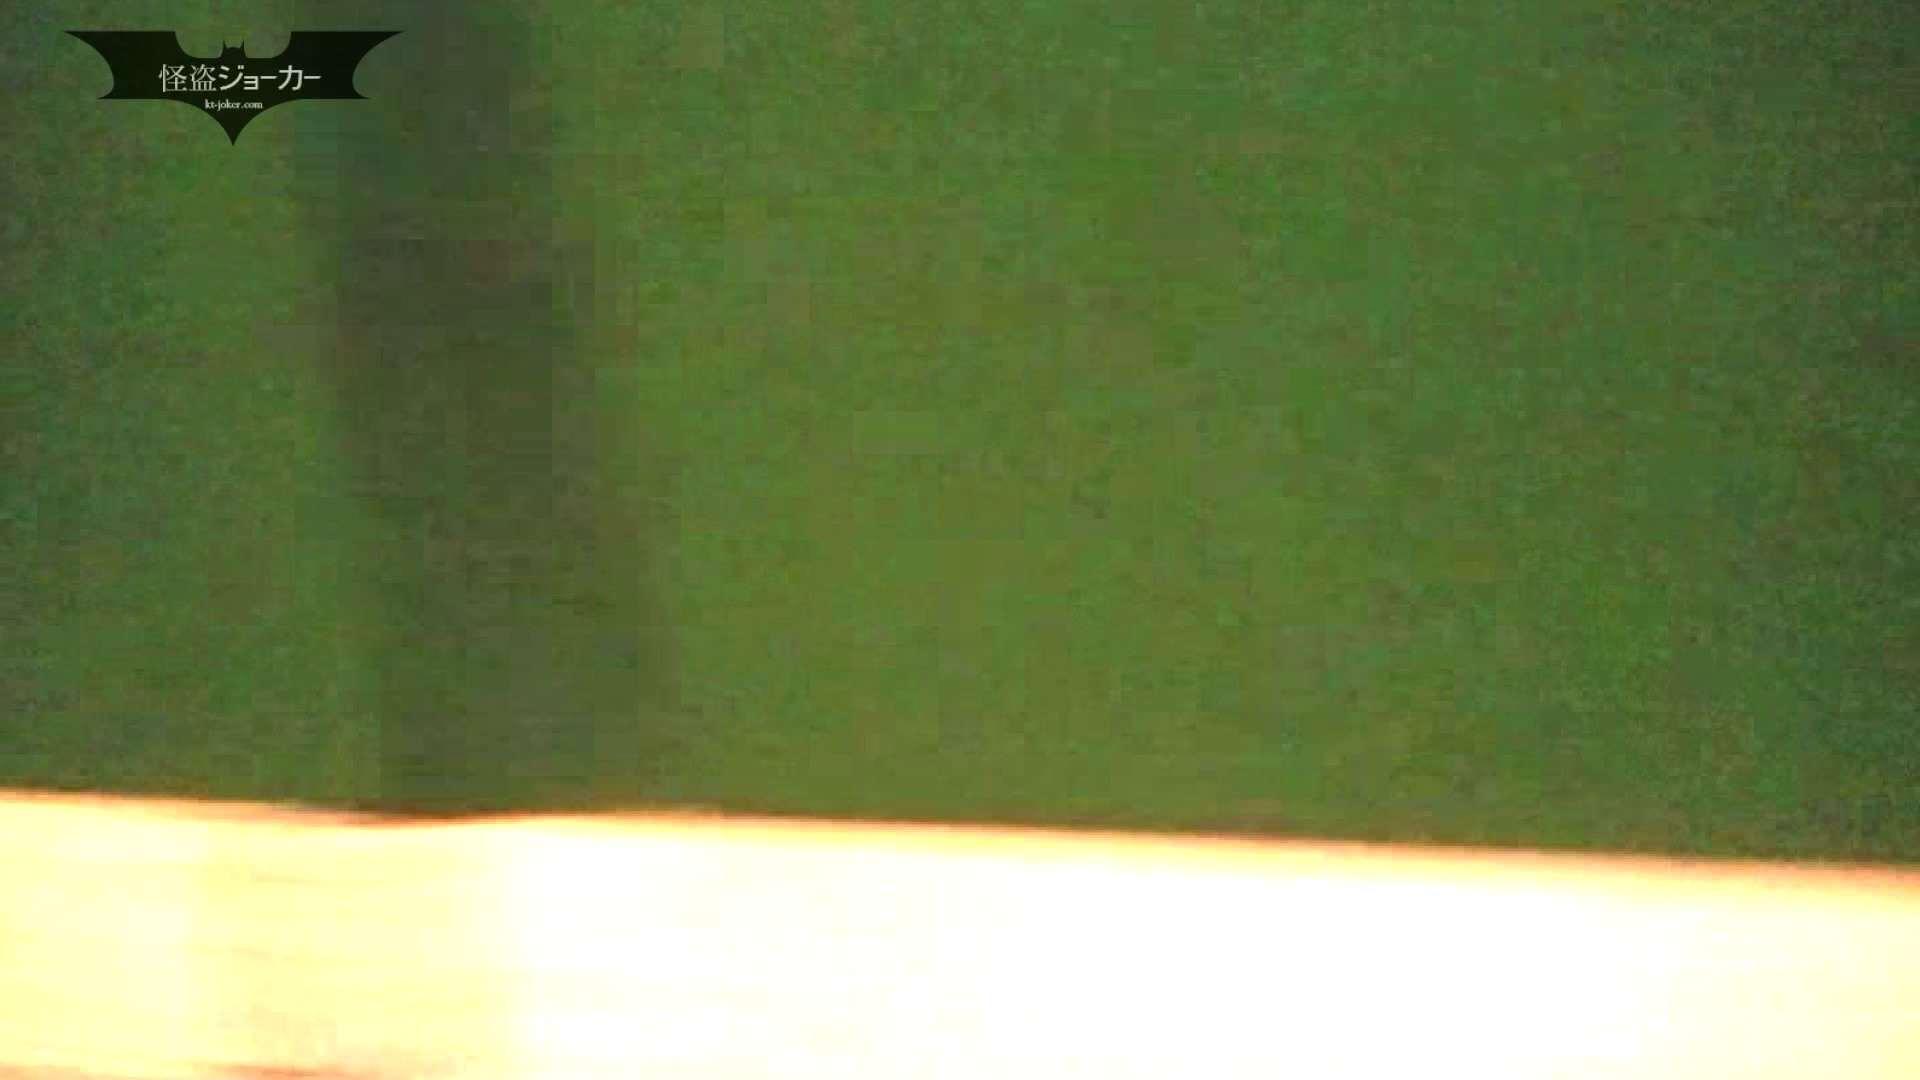 化粧室絵巻 番外編 VOL.20 OLハメ撮り  90Pix 37